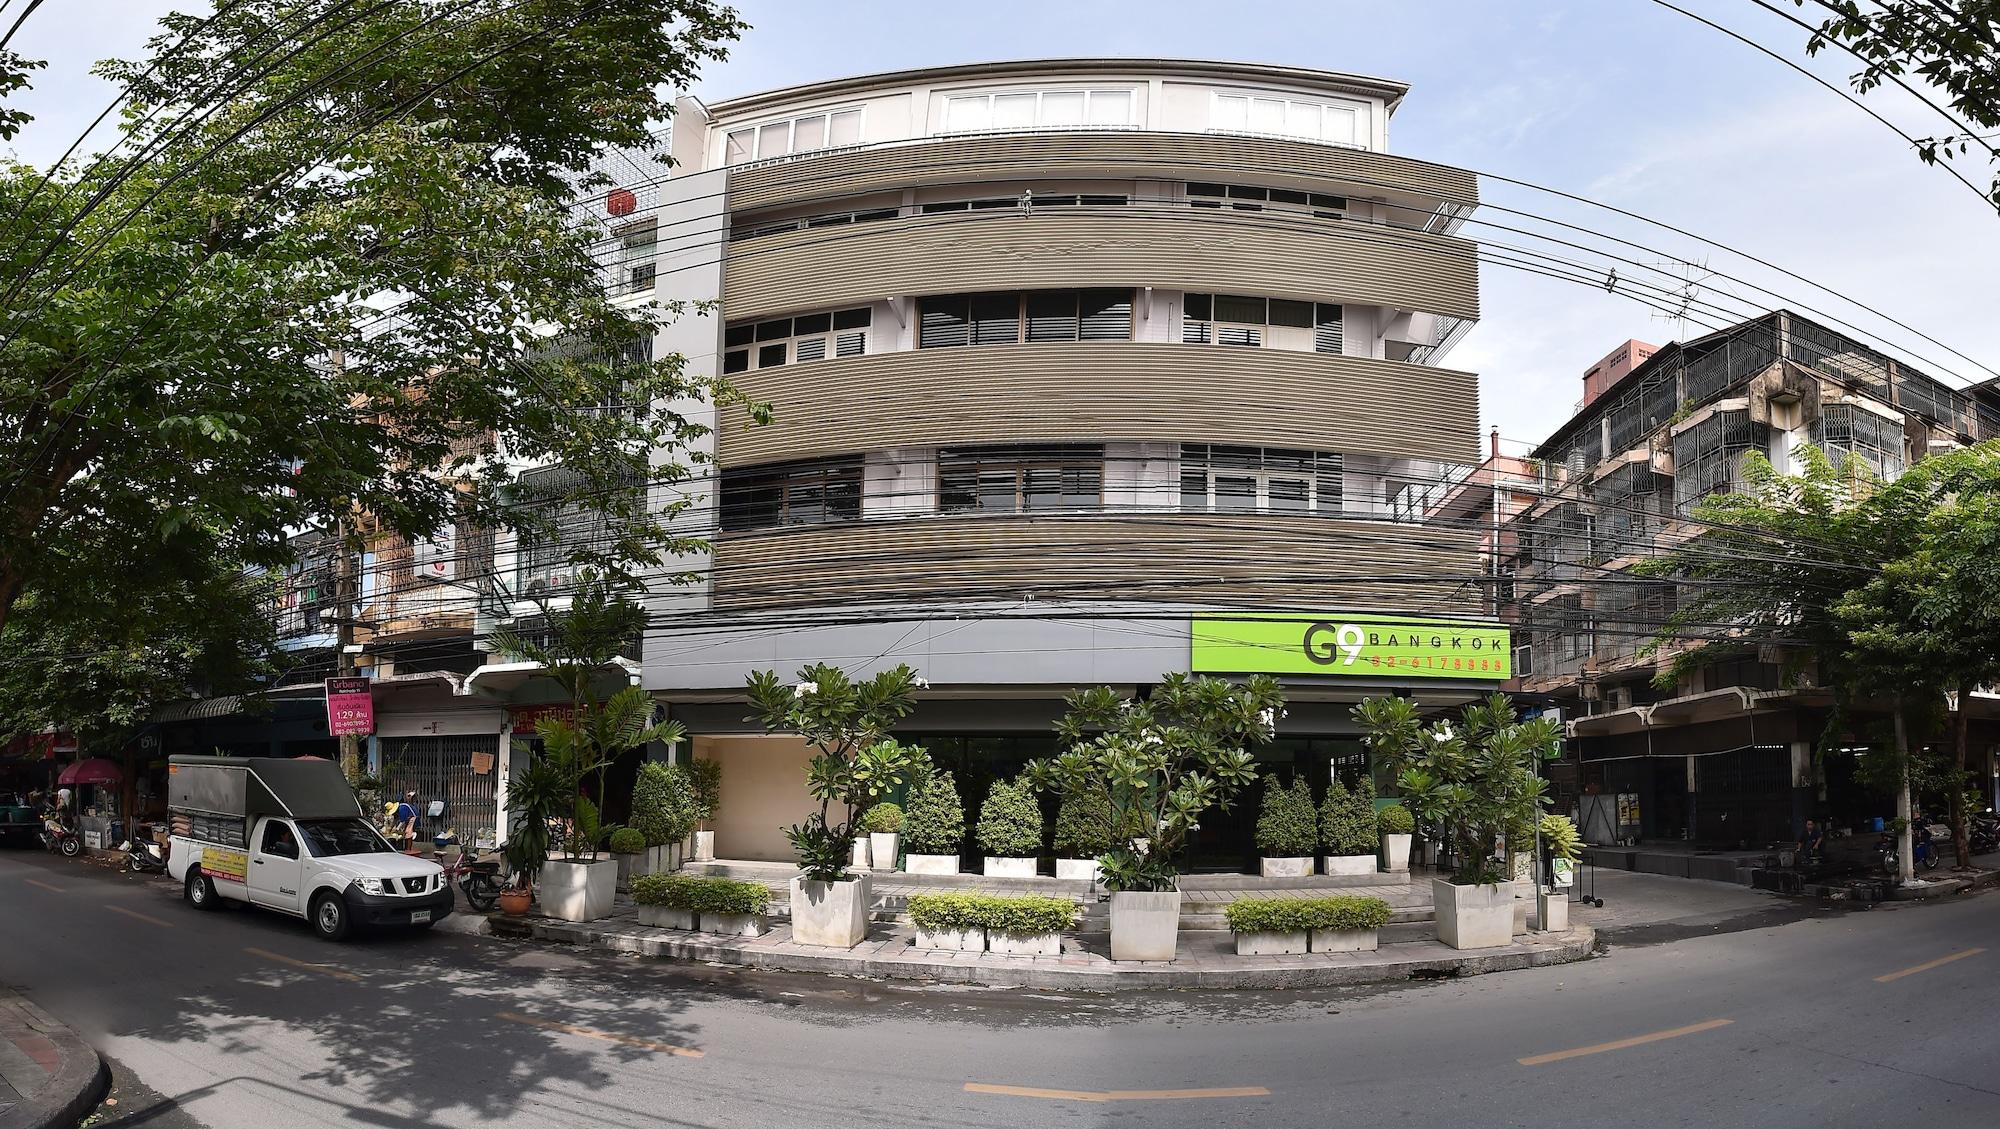 G9 Bangkok, Chatuchak